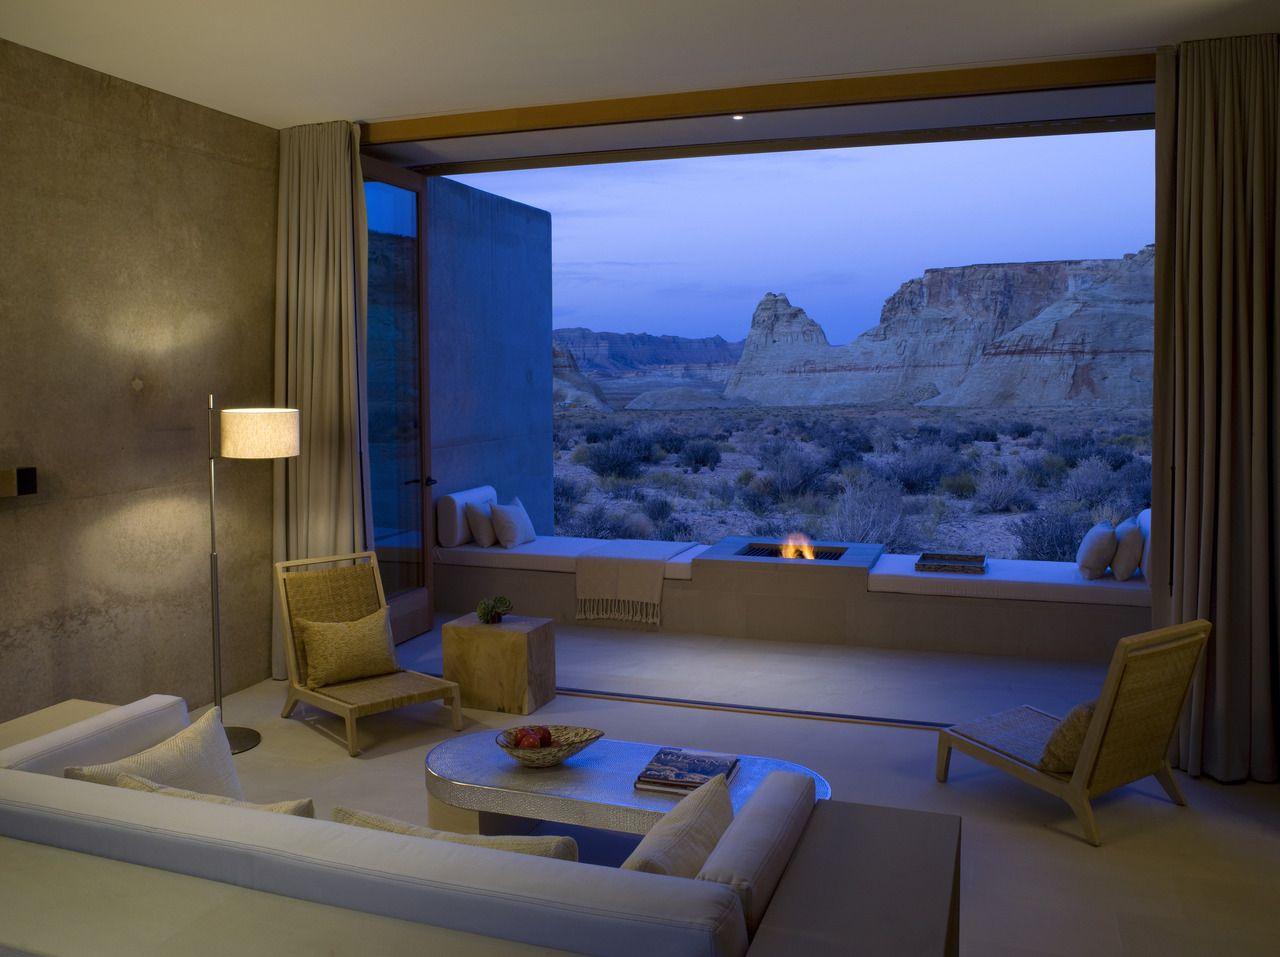 decor, interior, window, scenery, | Blurring | Pinterest | Sofá ...